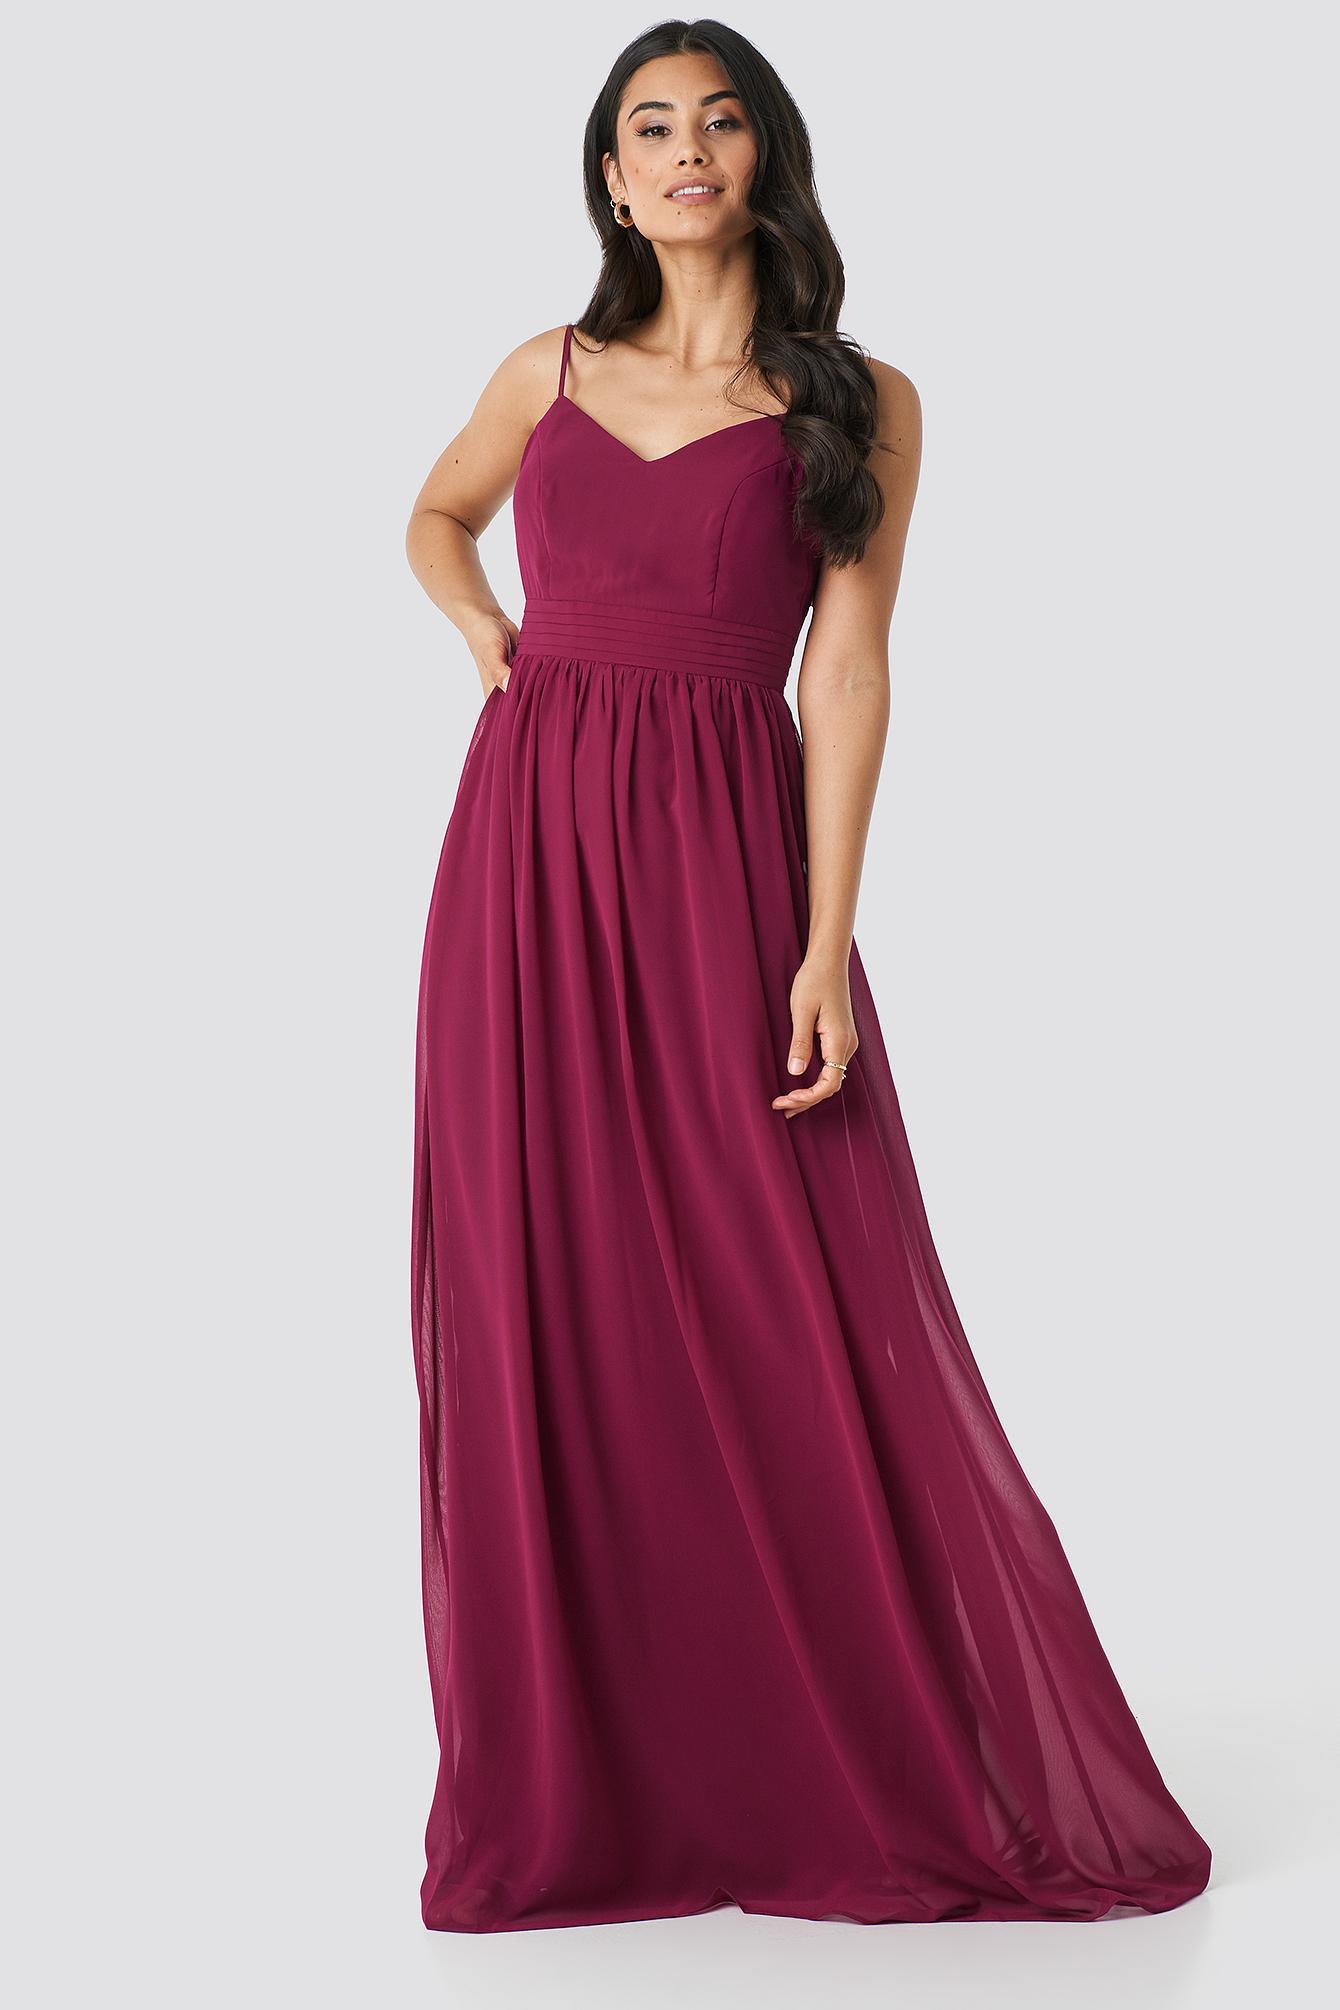 9b3955ca199f9 Trendyol Back Detailed Evening Dress Purple